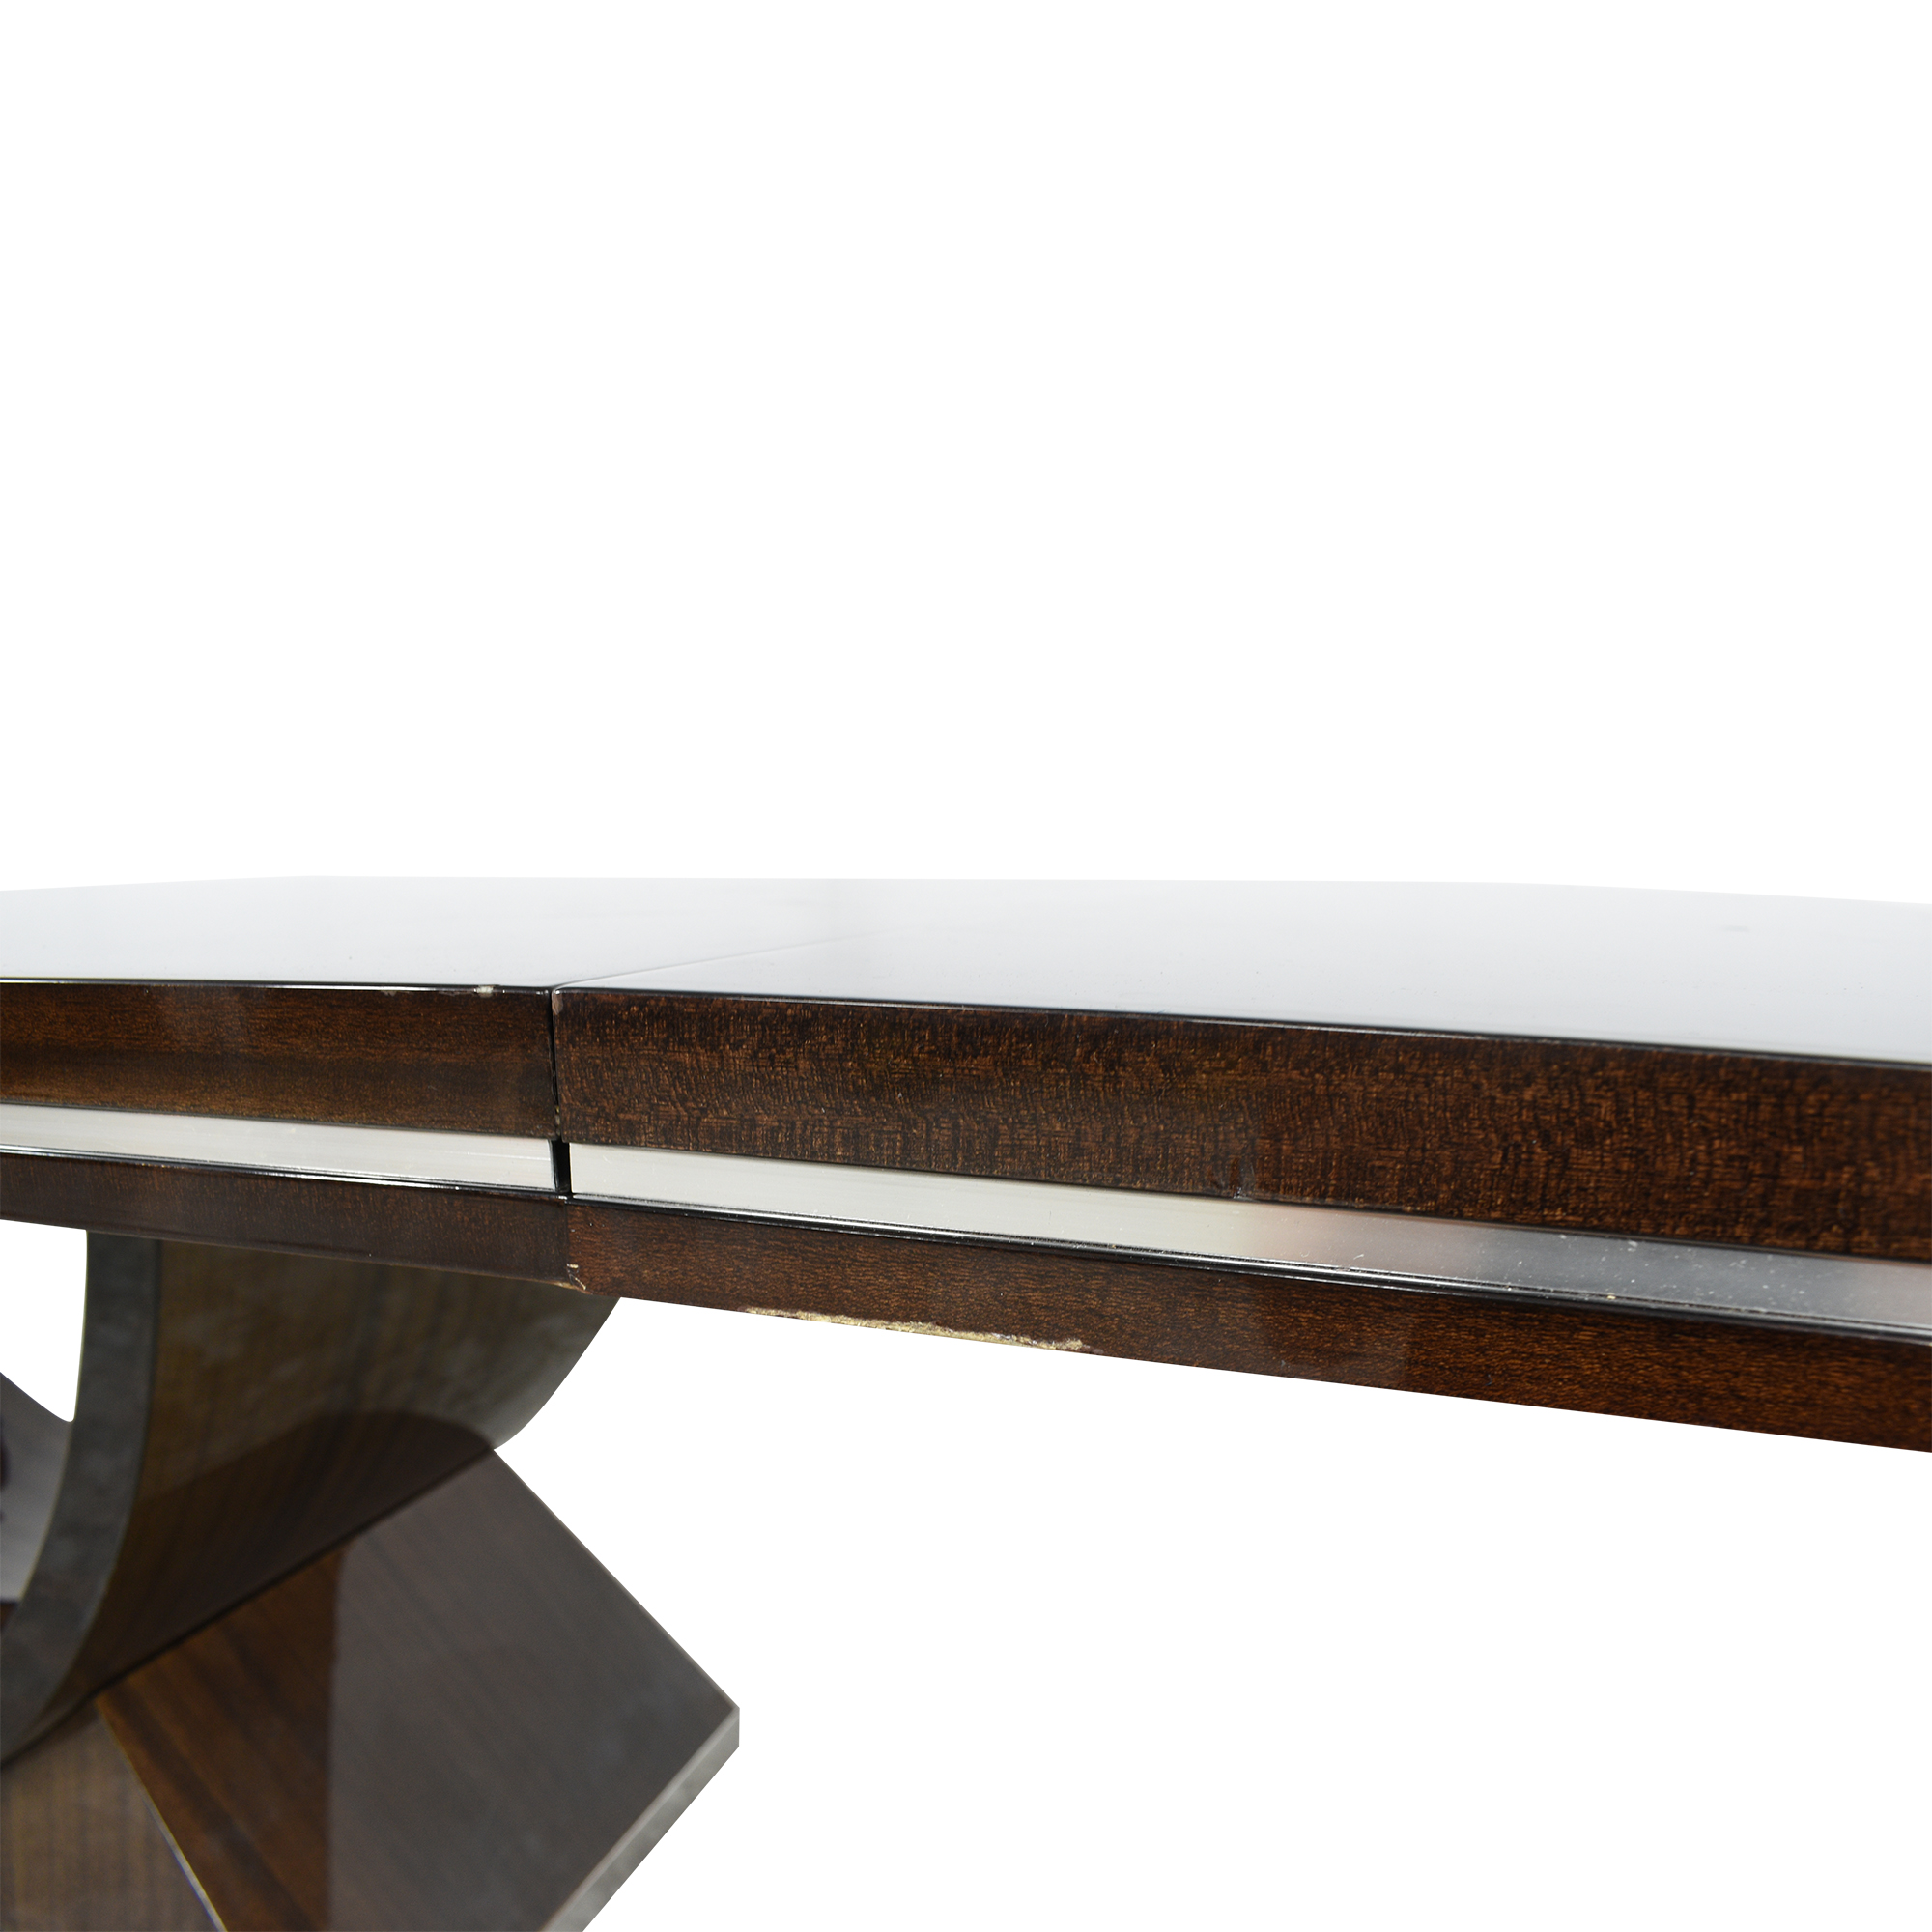 Pietro Costantini Pietro Costantini Contemporary Extendable Dining Table used